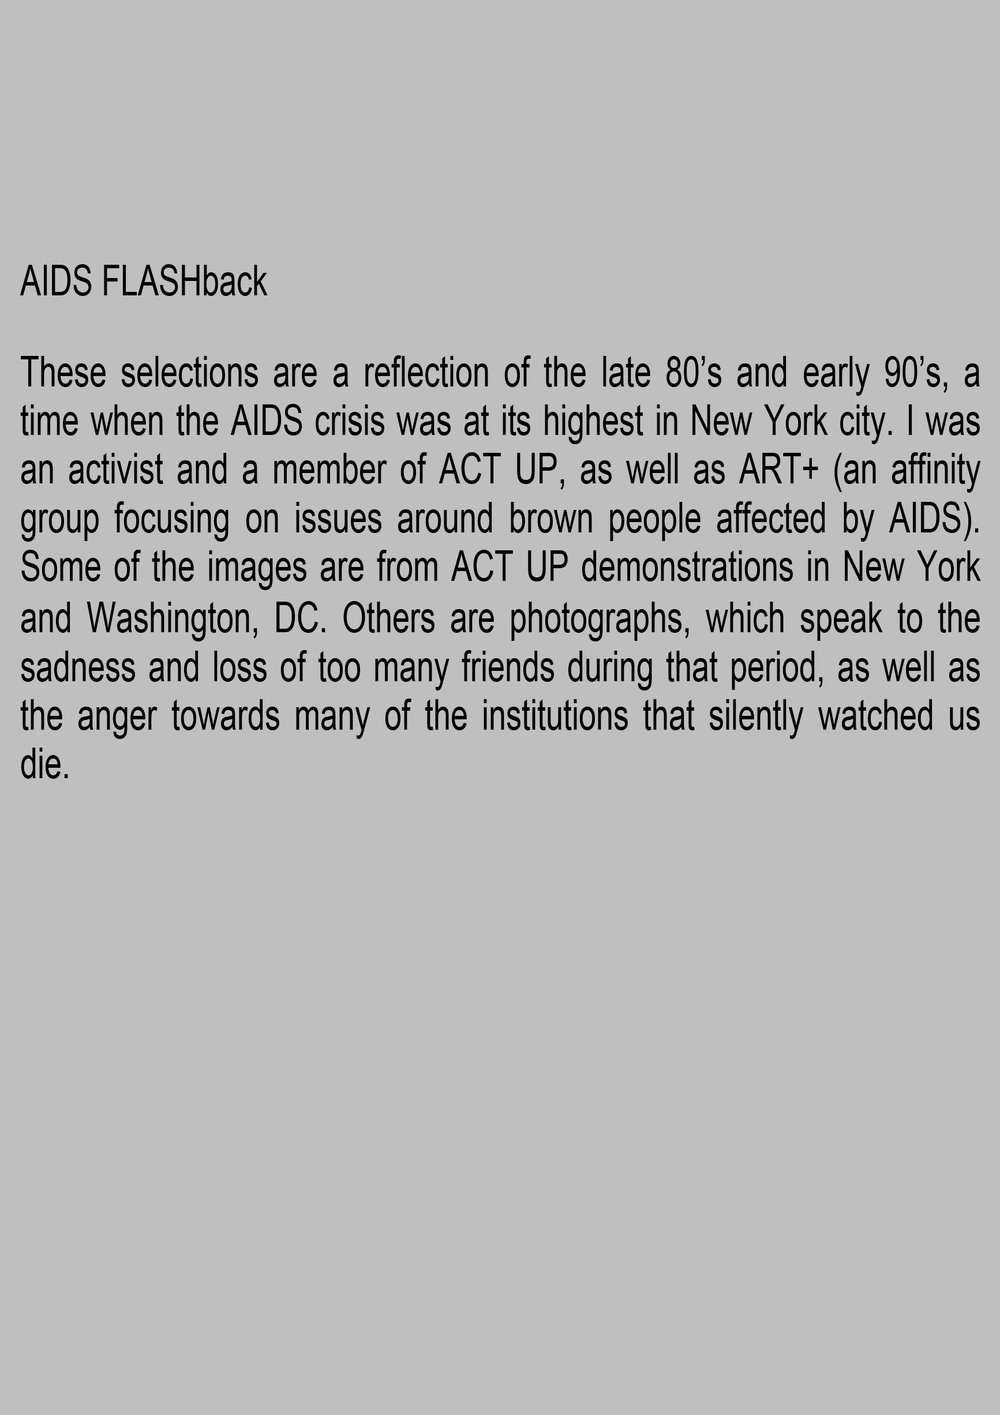 AIDS_flashback.jpg